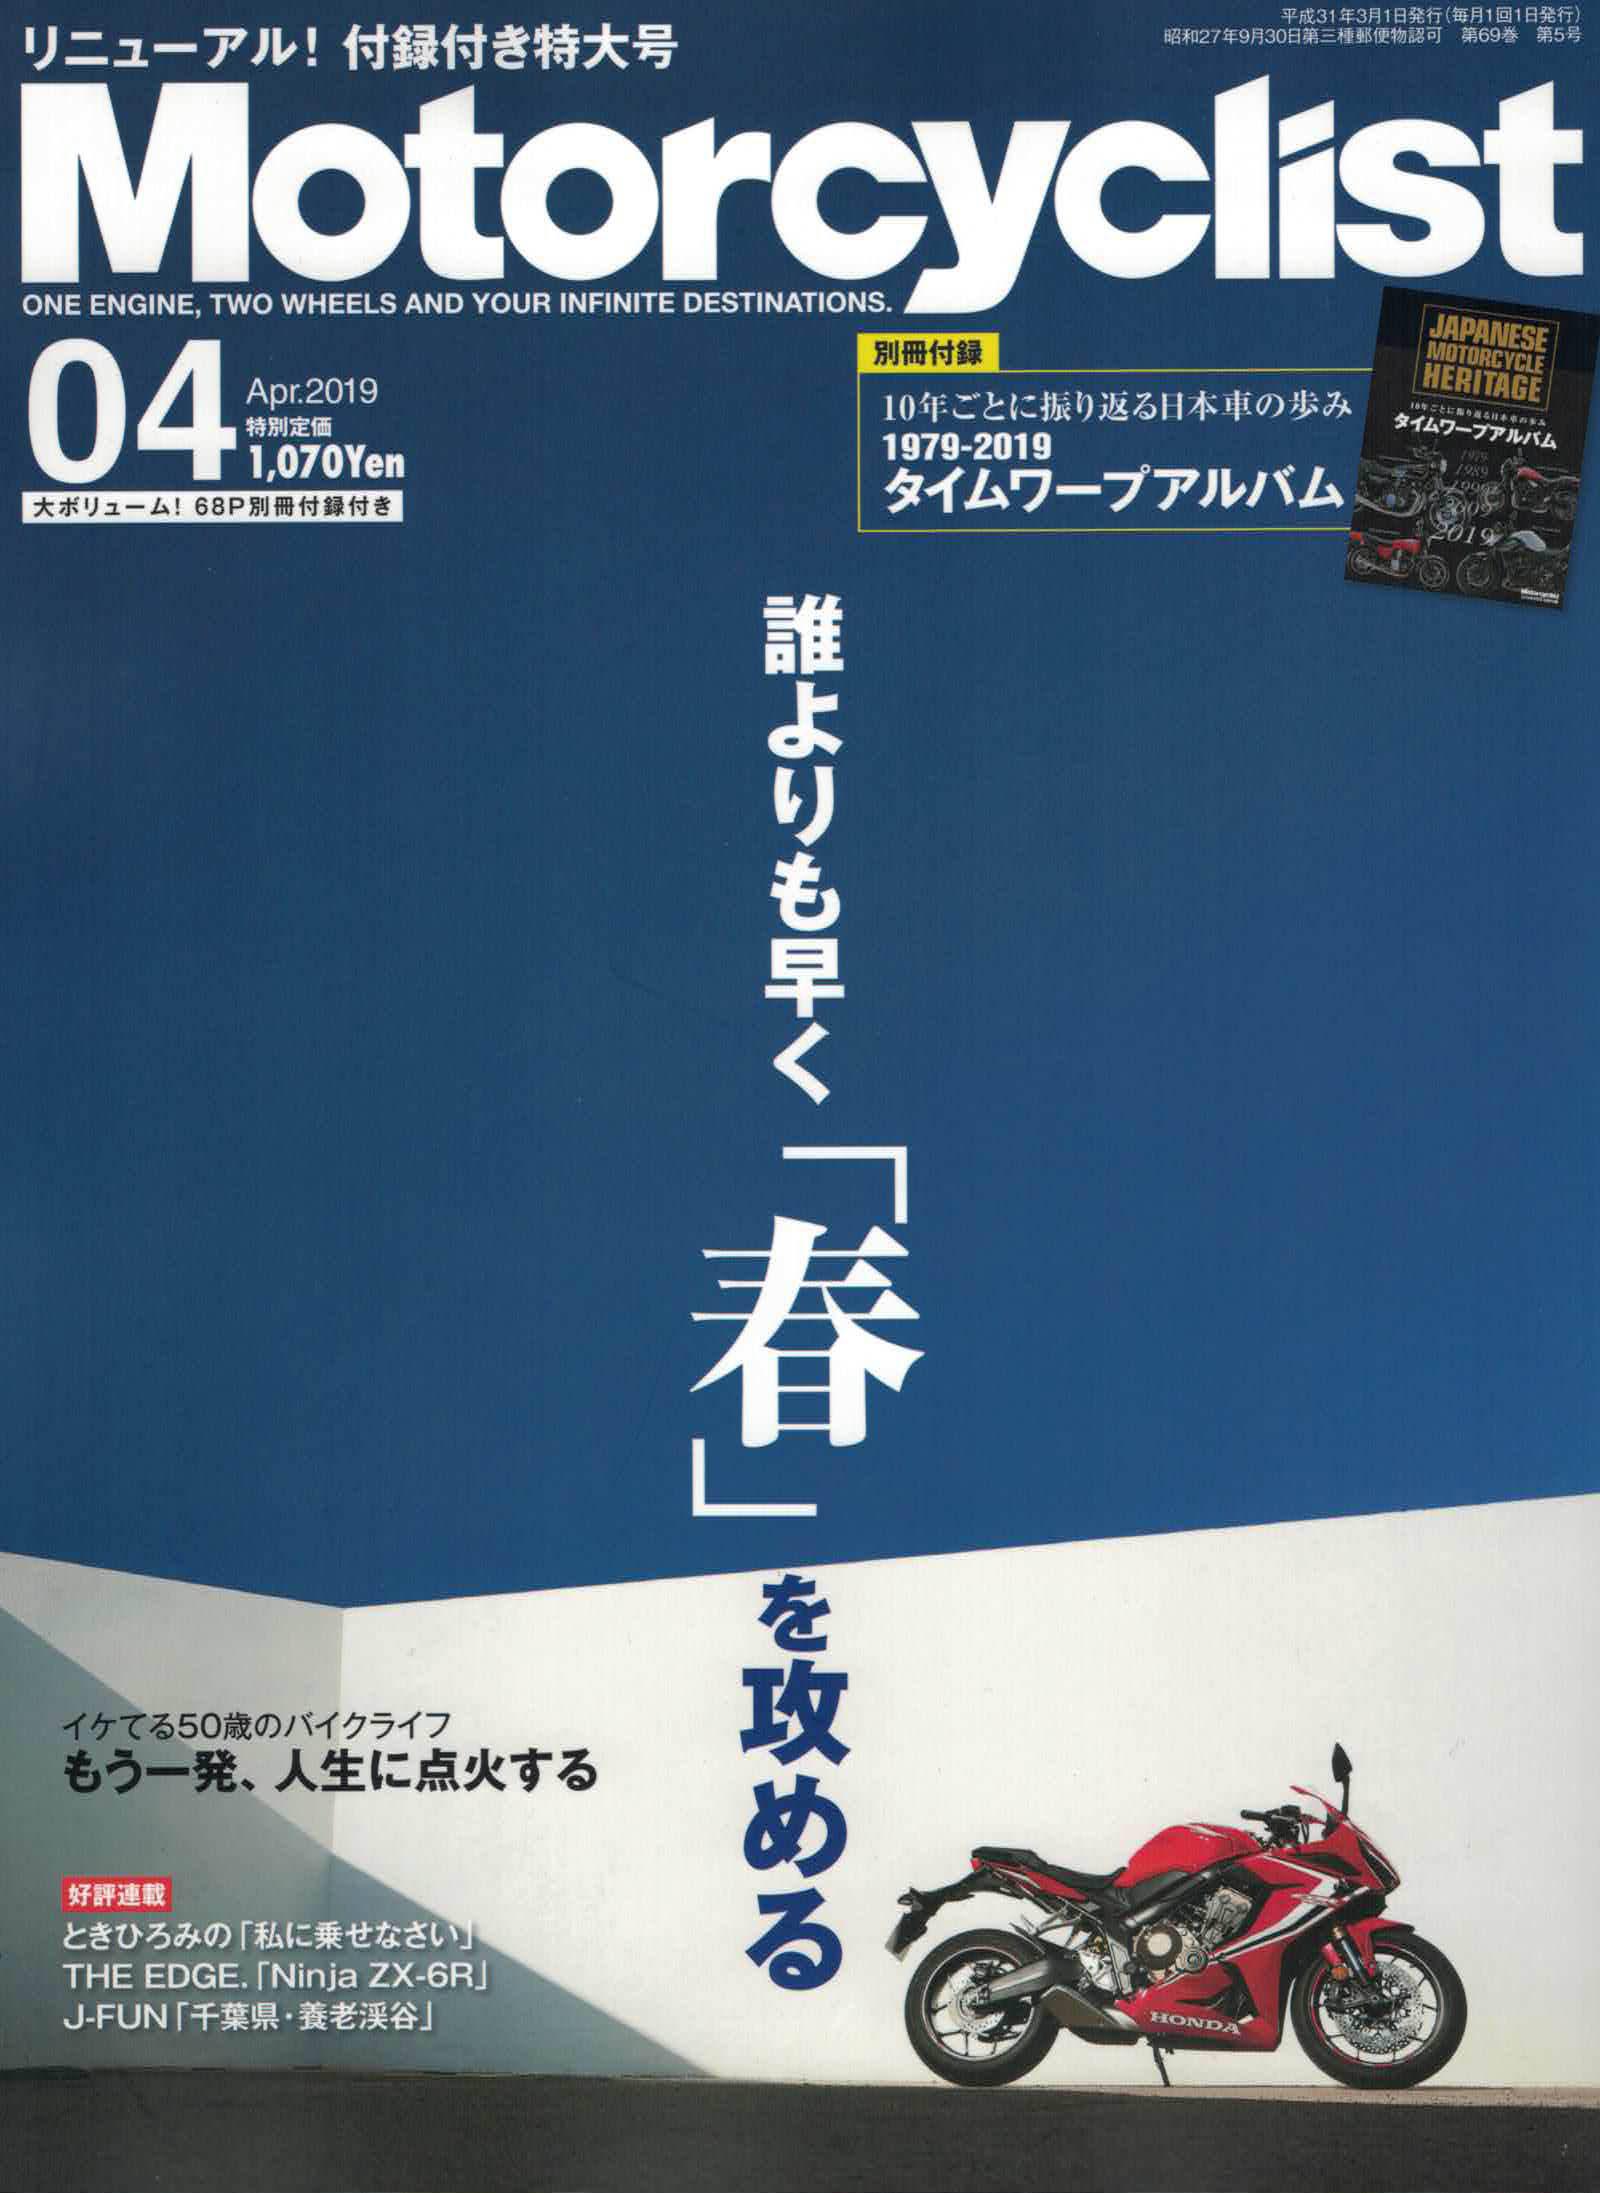 【Motorcyclist4月号掲載】LED RIBBON REVO